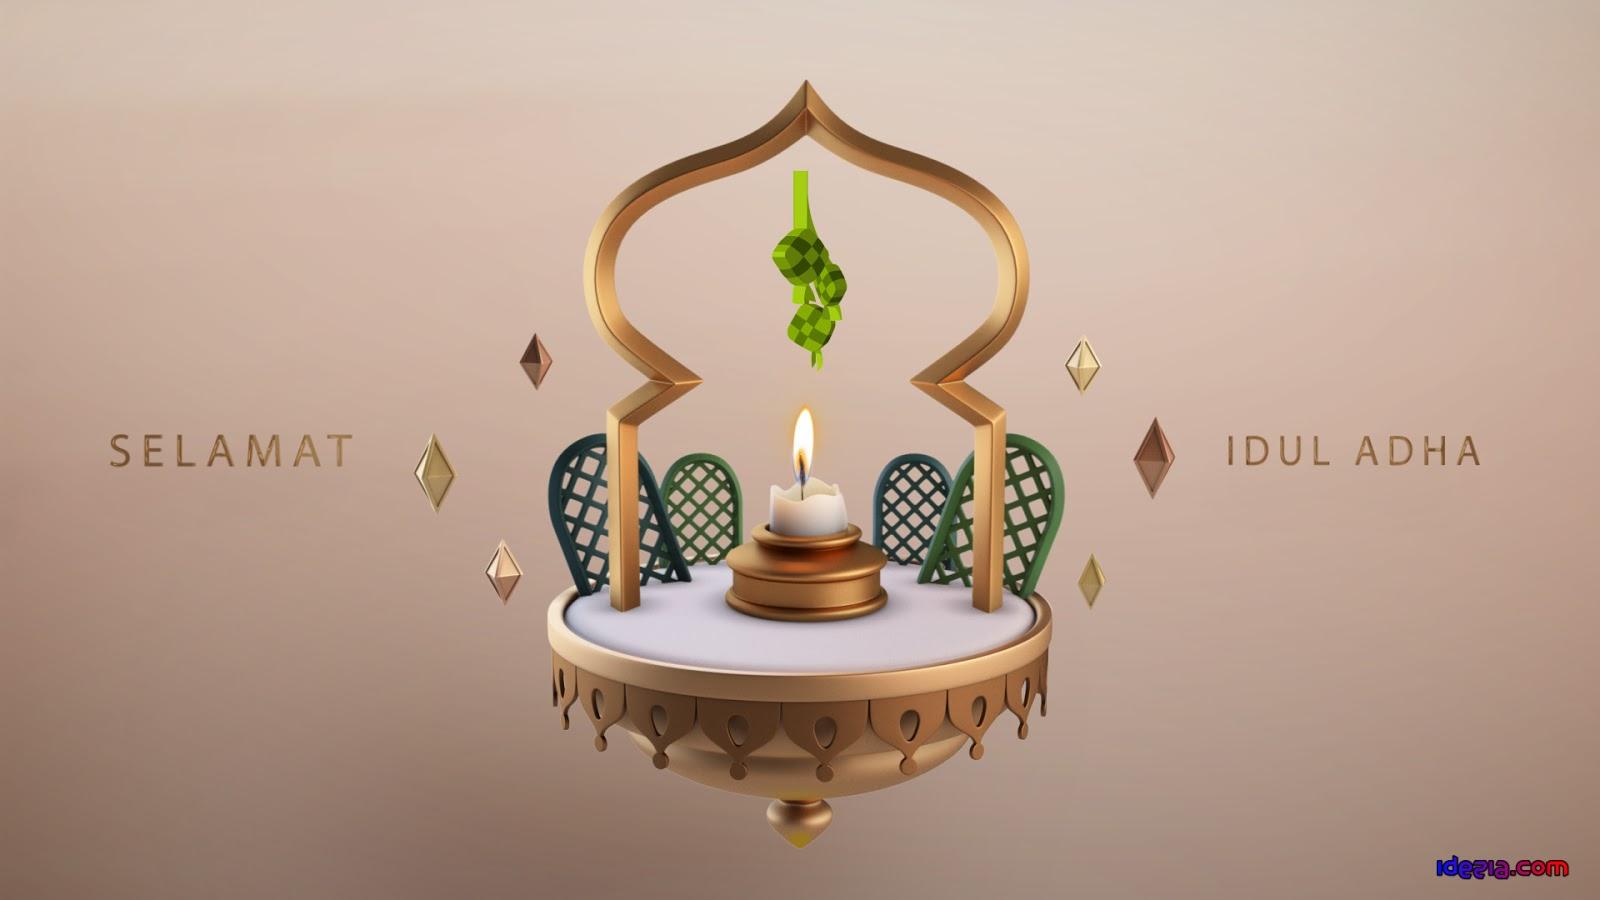 Gampar Ucapan Selamat Idul Adha Terbaru 2020 1441 Hijriyah Lebaran Haji untuk WhatsApp, Instagram, Youtube